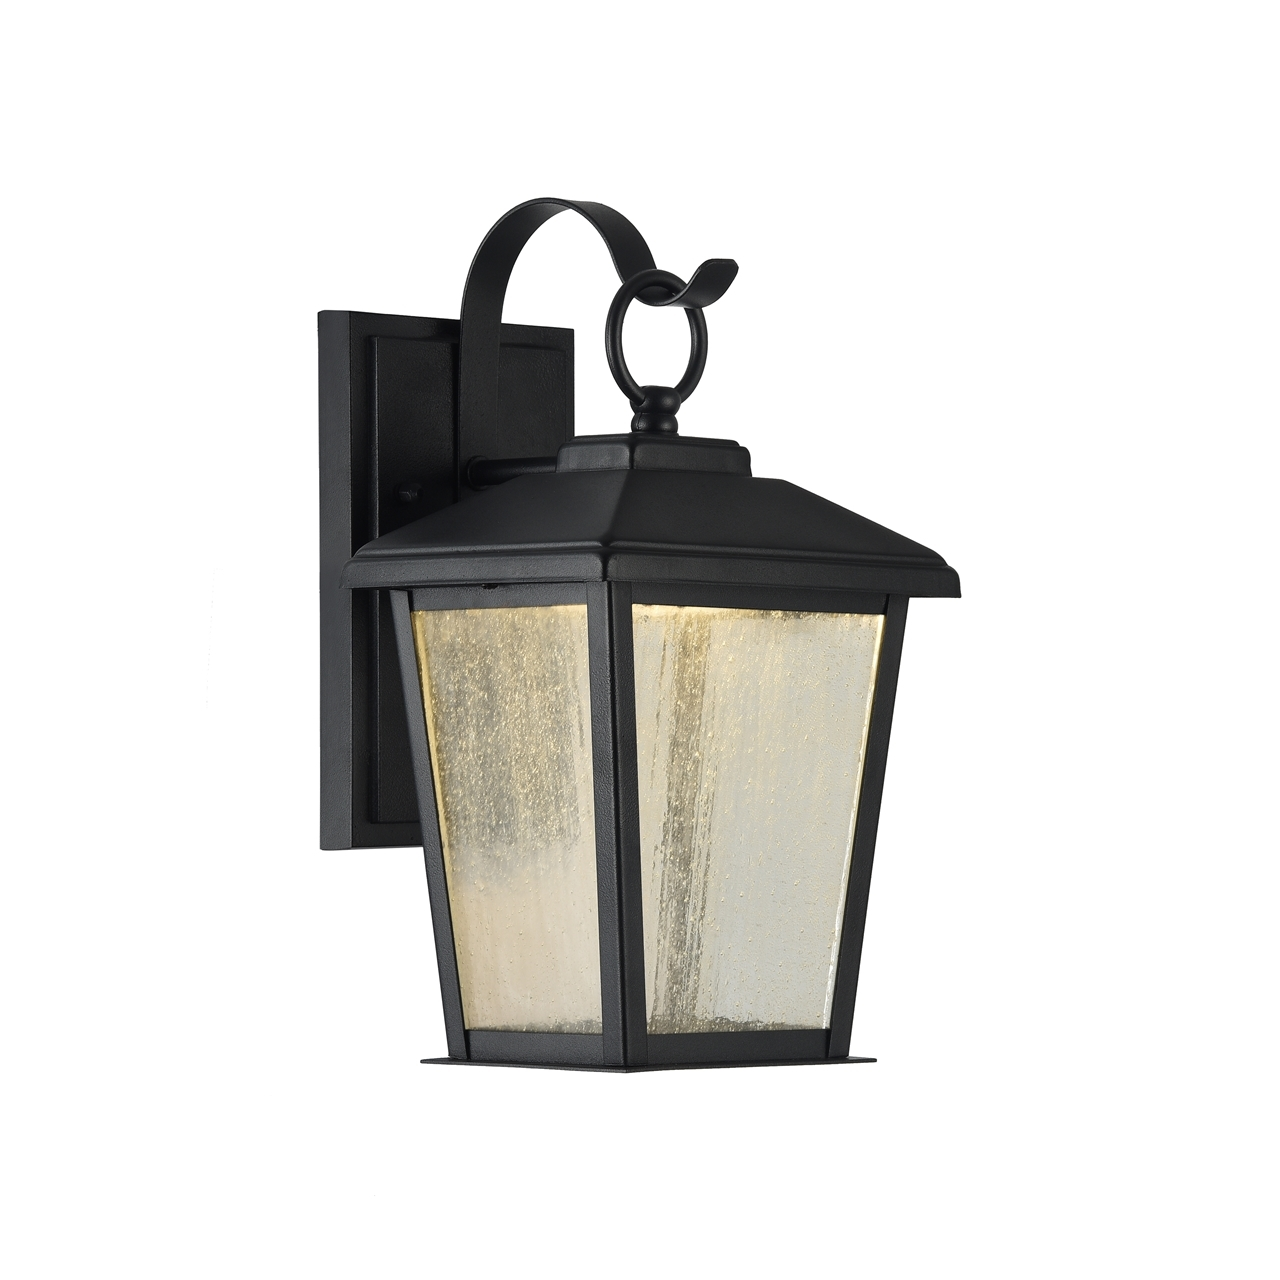 CHLOE Lighting, Inc CHLOE Lighting KIRTON Transitional ... on Sconce Outdoor Lighting id=57302